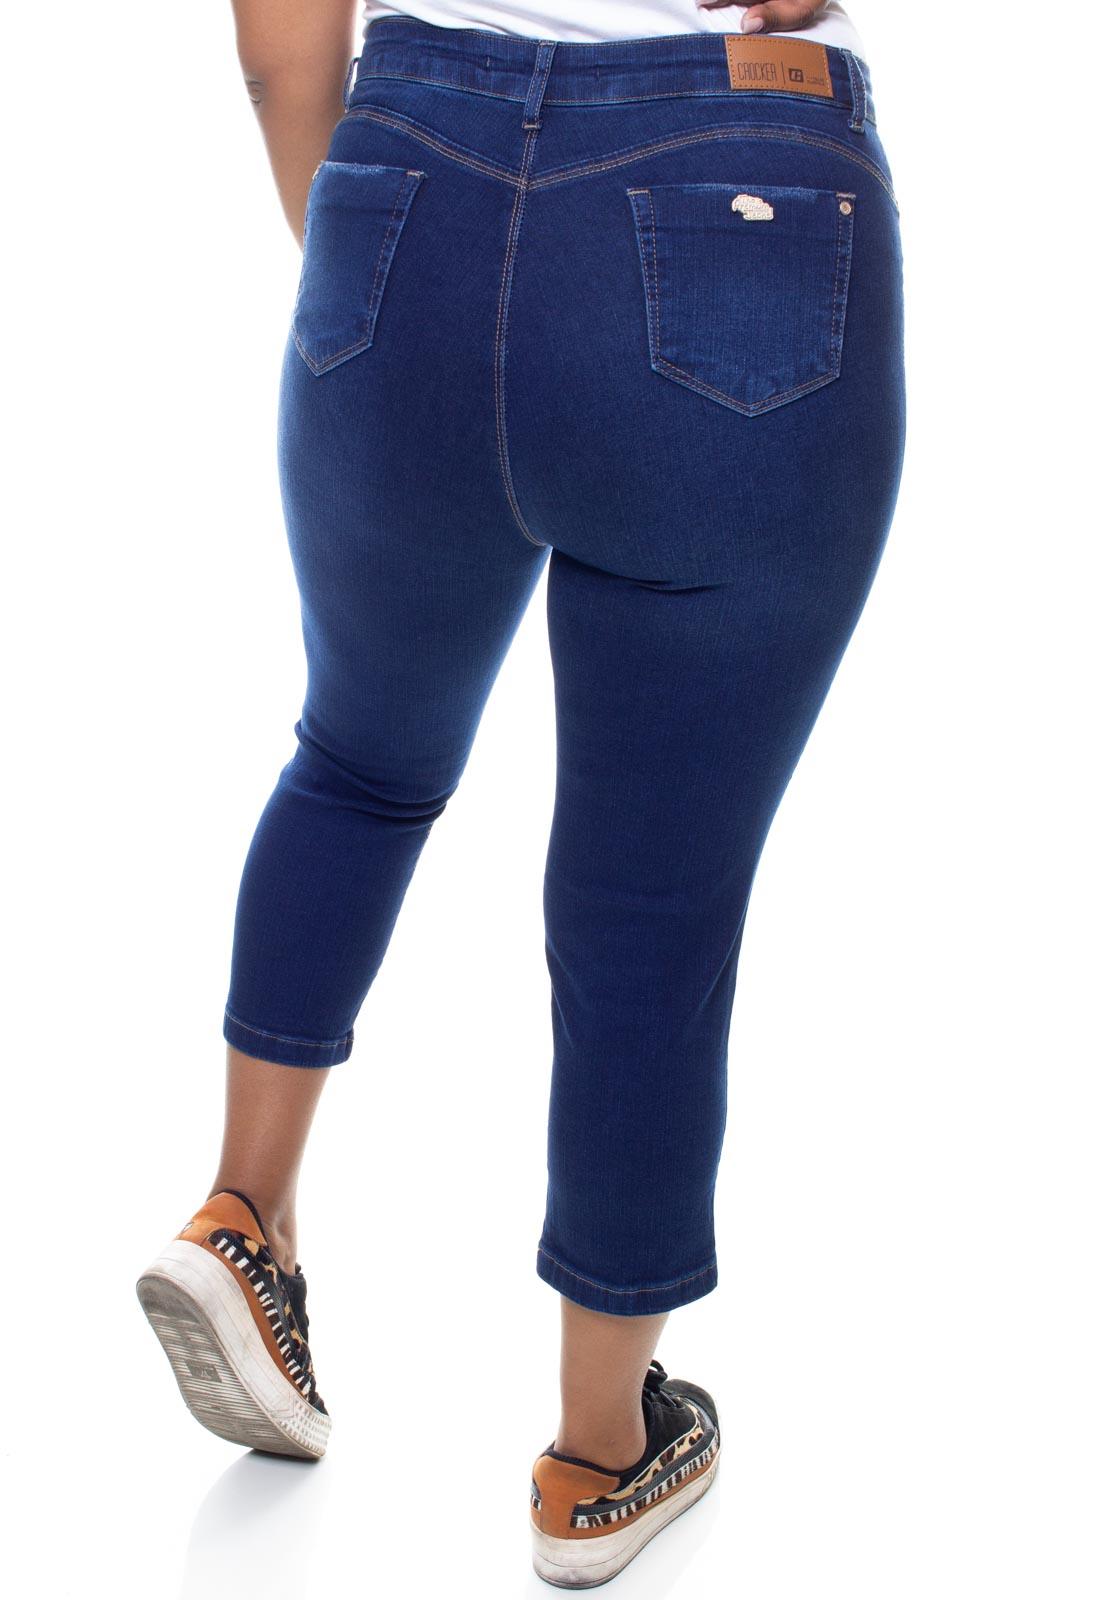 Calça Jeans Plus Size Feminina Capri Crocker - 47753  - CROCKER JEANS